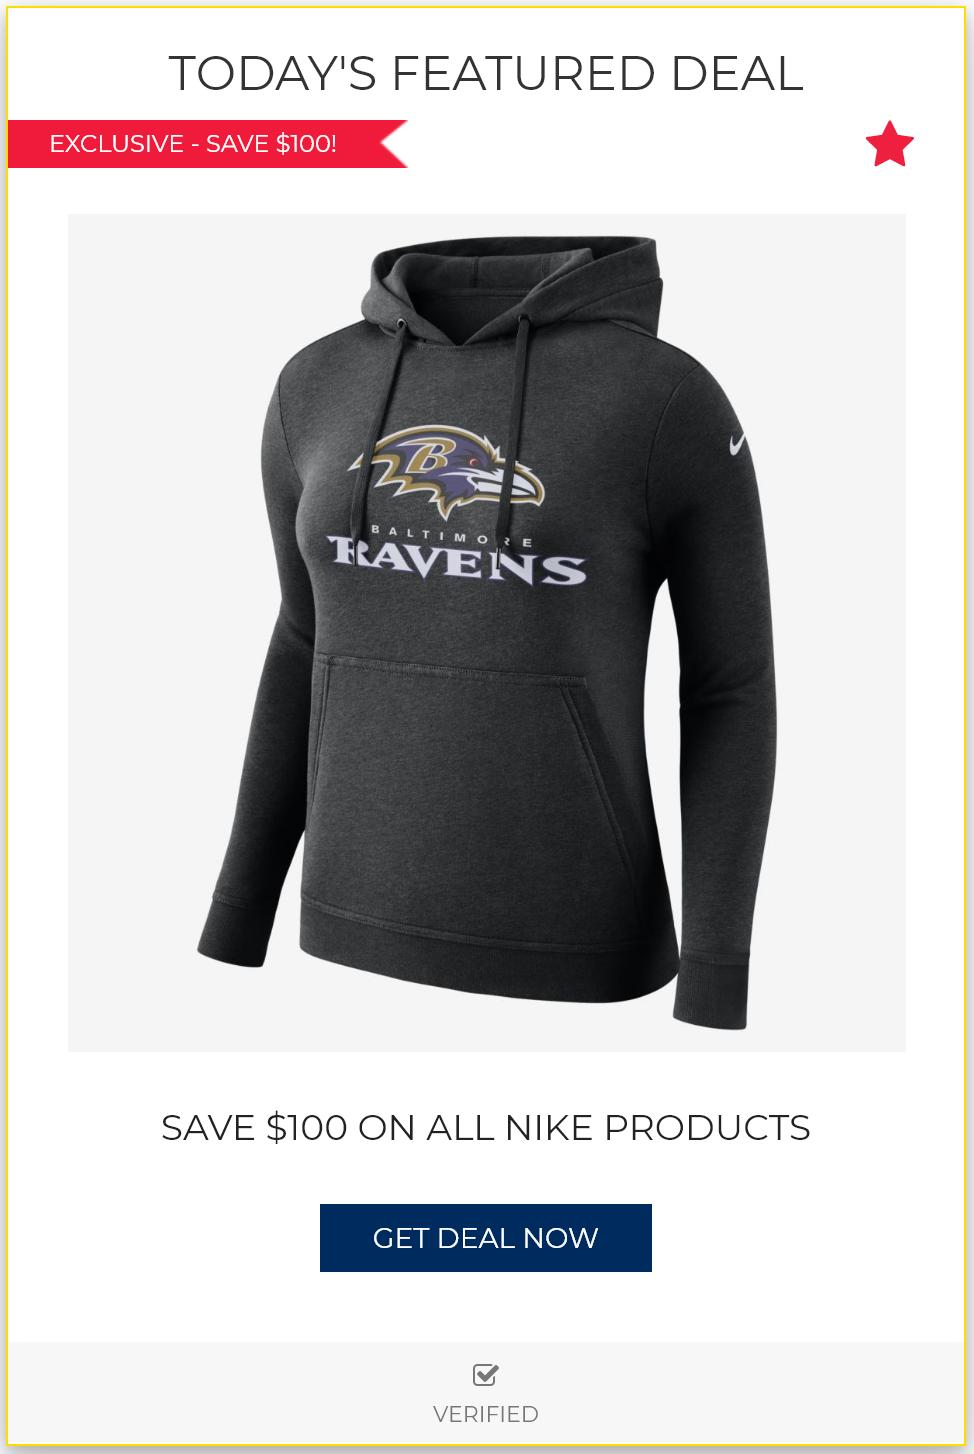 Predownload: Nike Club Fleece Nfl Ravens Women S Fleece Pullover Hoodie Black Fleece Pullover Womens Fleece Pullover Womens Fleece [ 1454 x 974 Pixel ]